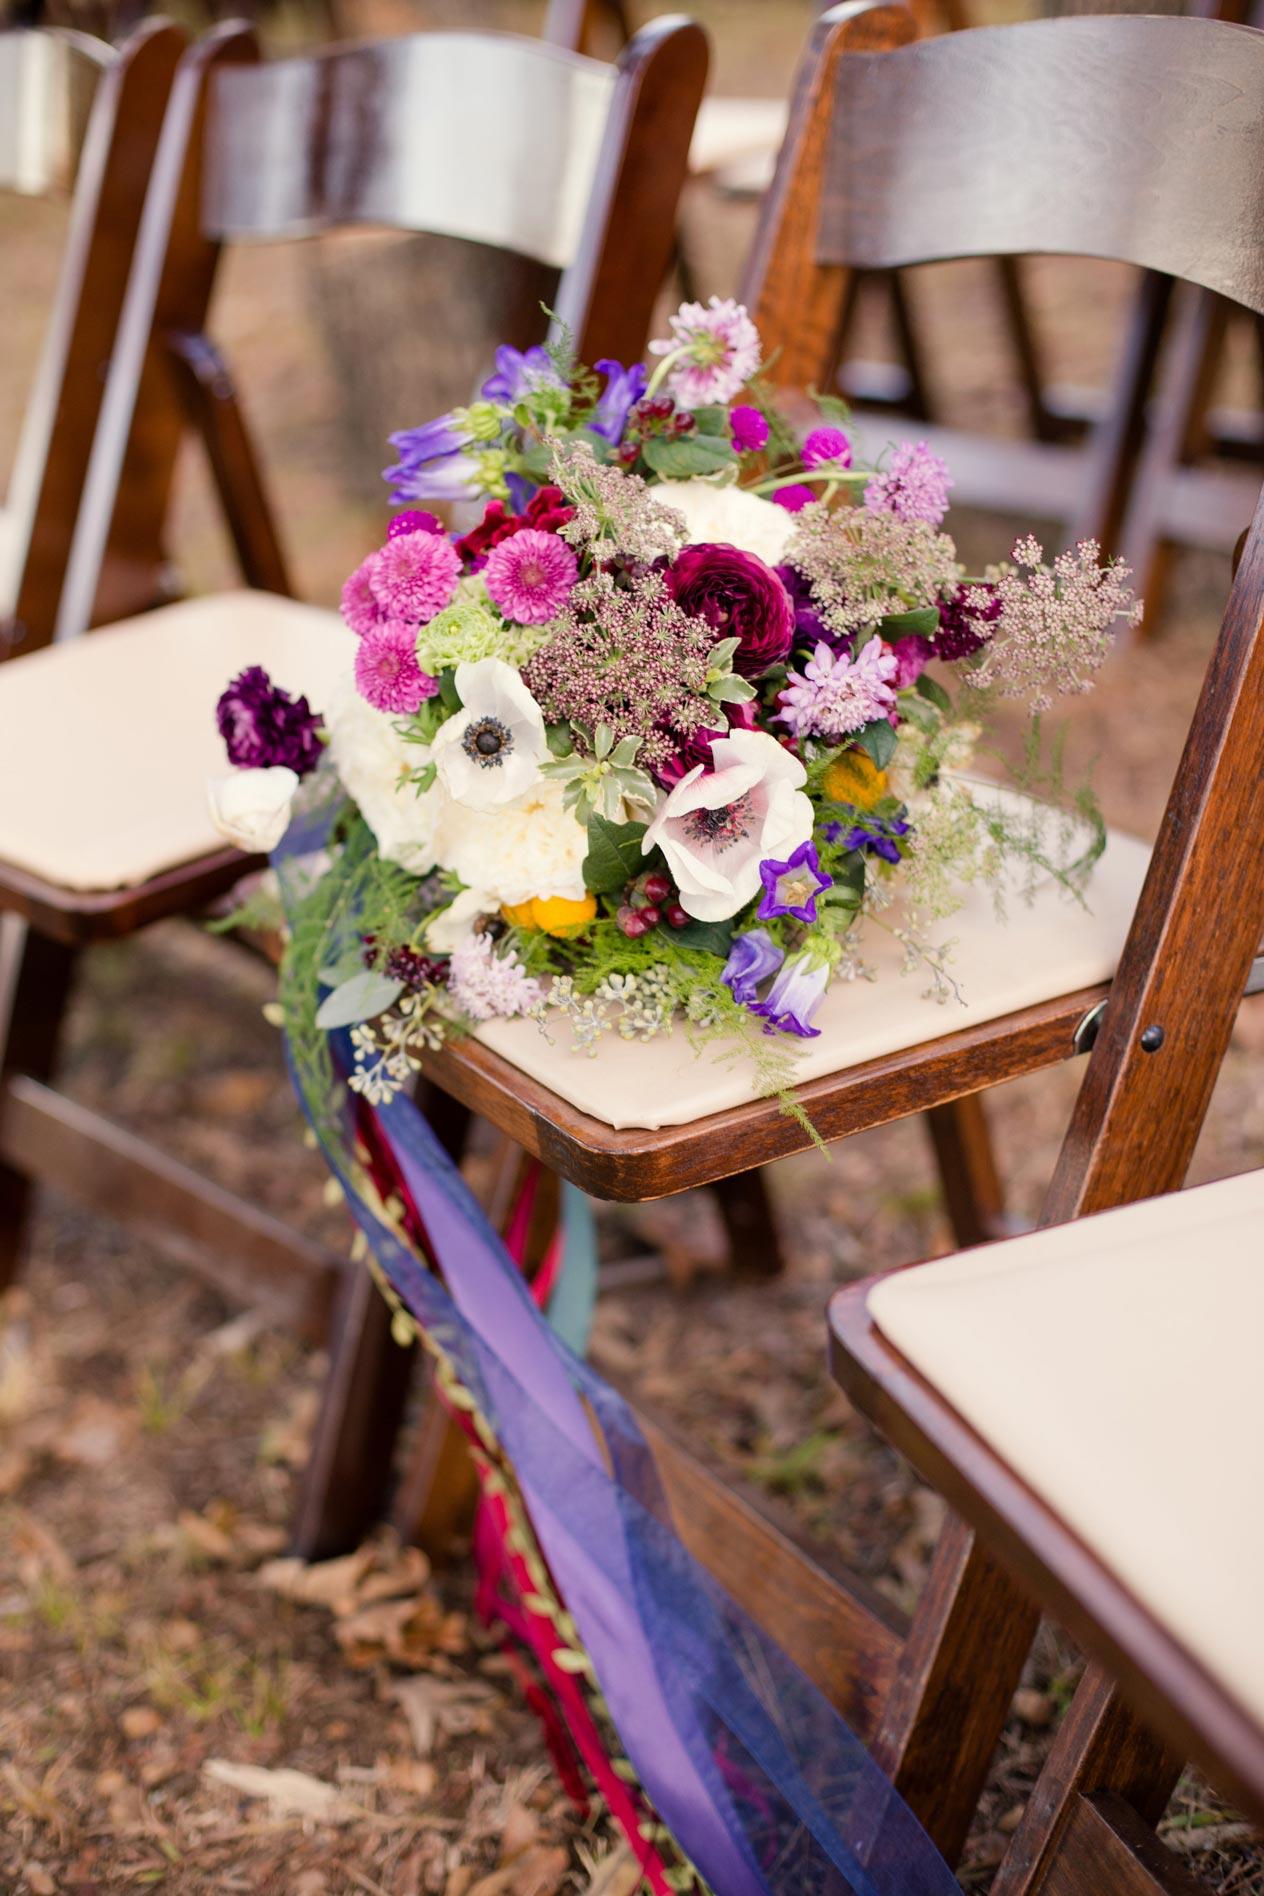 Rustic-Whimsical-Wedding- Tulsa-Wedding-FloristRobyns-Flower-Garden_Mallory-Hall-Photography04.jpg